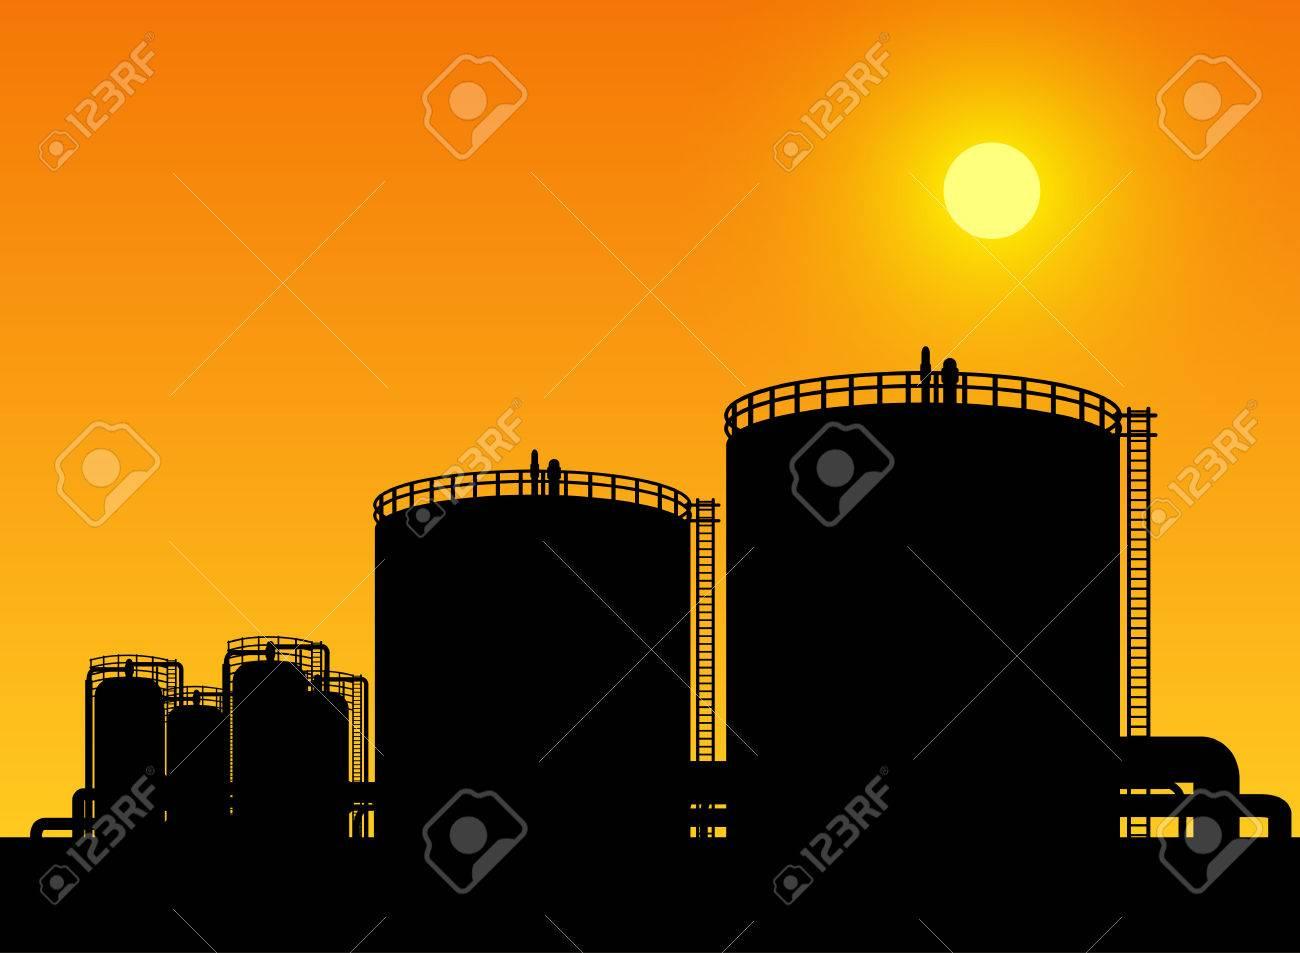 oil tank storage in oil refinery petrochemical industry estate - 31827603